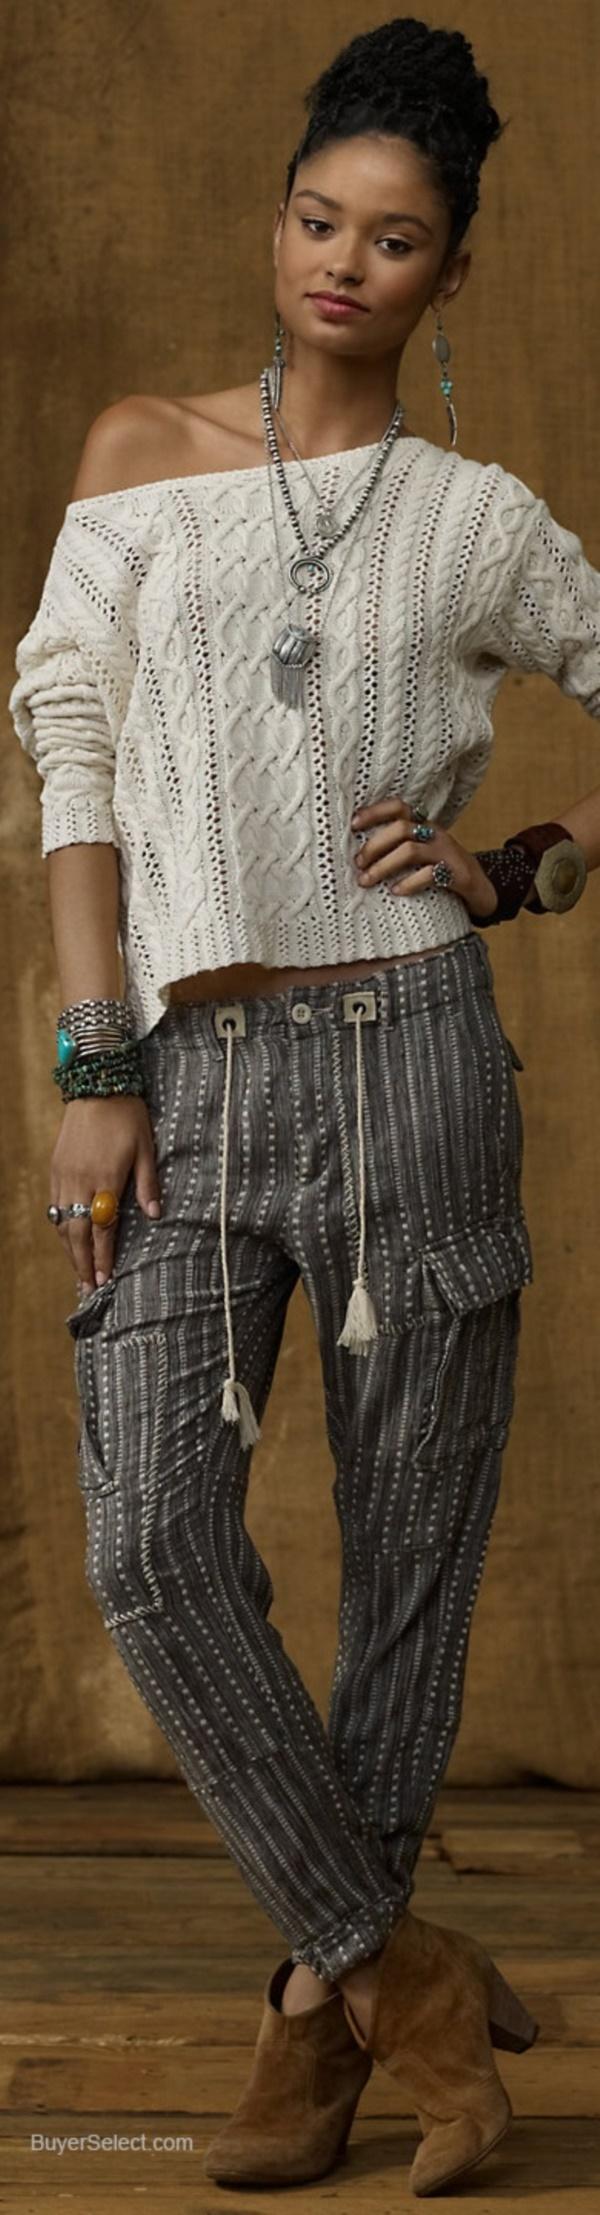 boho chic fashions outfits1051